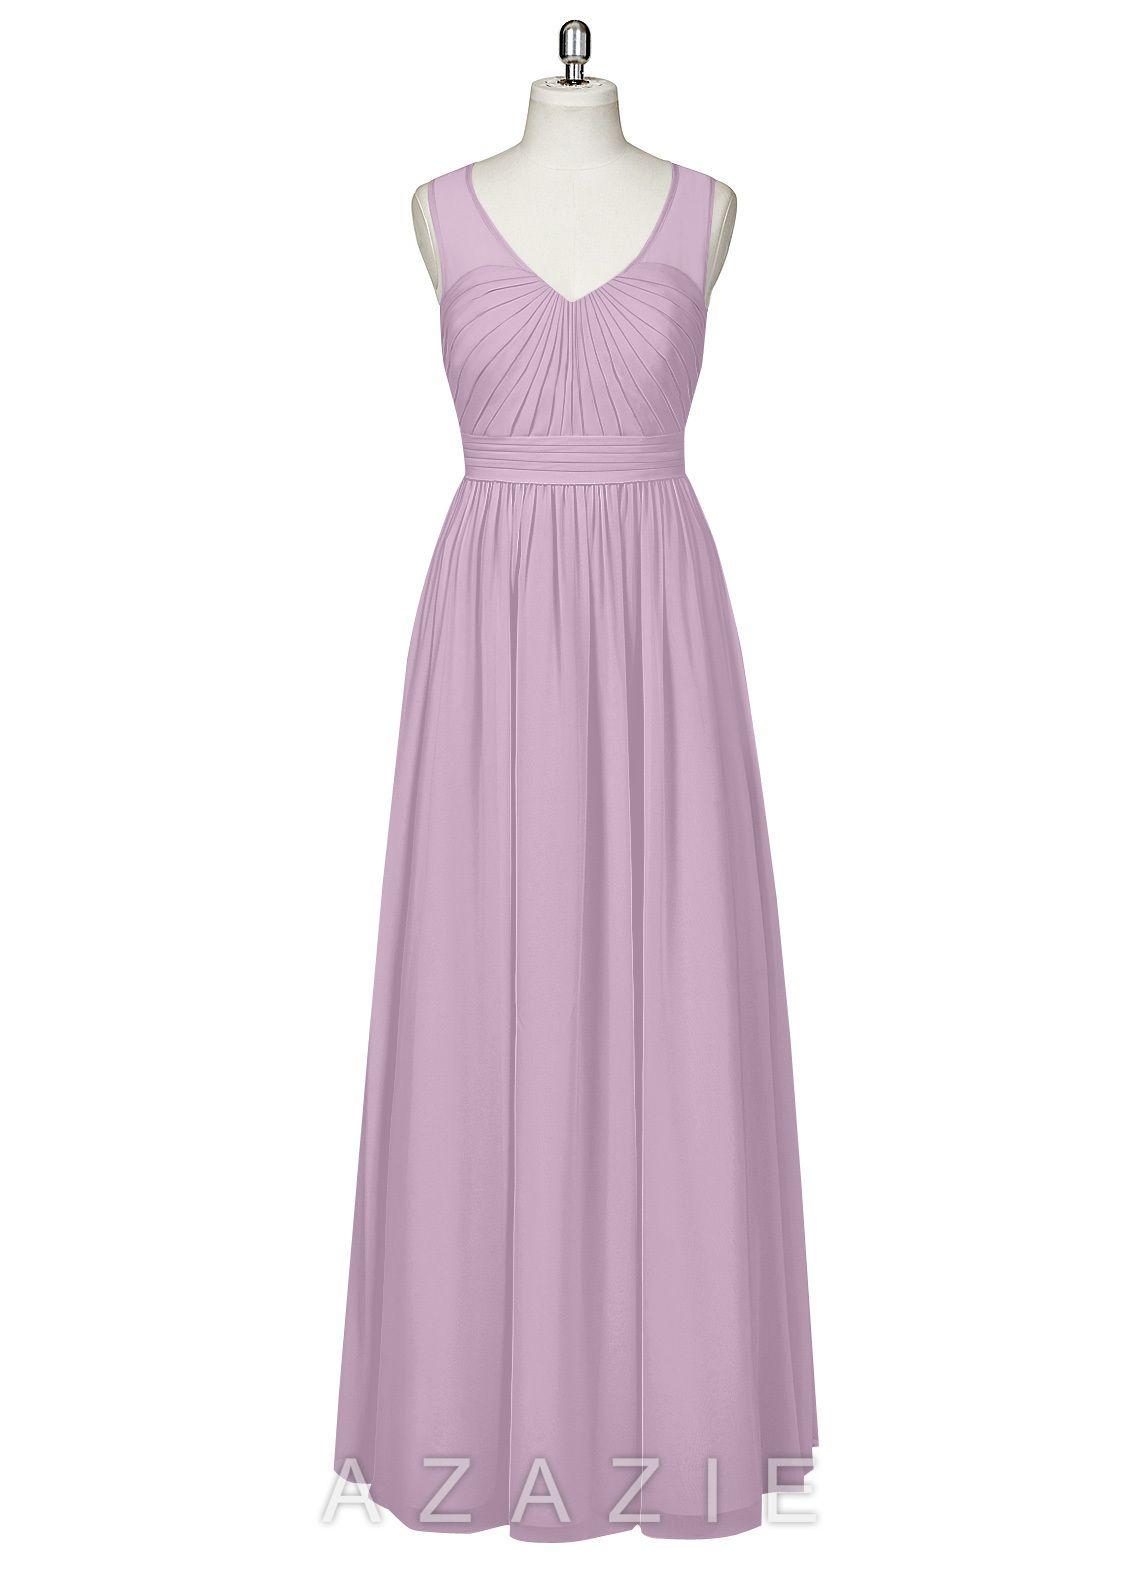 Raquel bridesmaid dress favorite color raquel bridesmaid dress ombrellifo Gallery